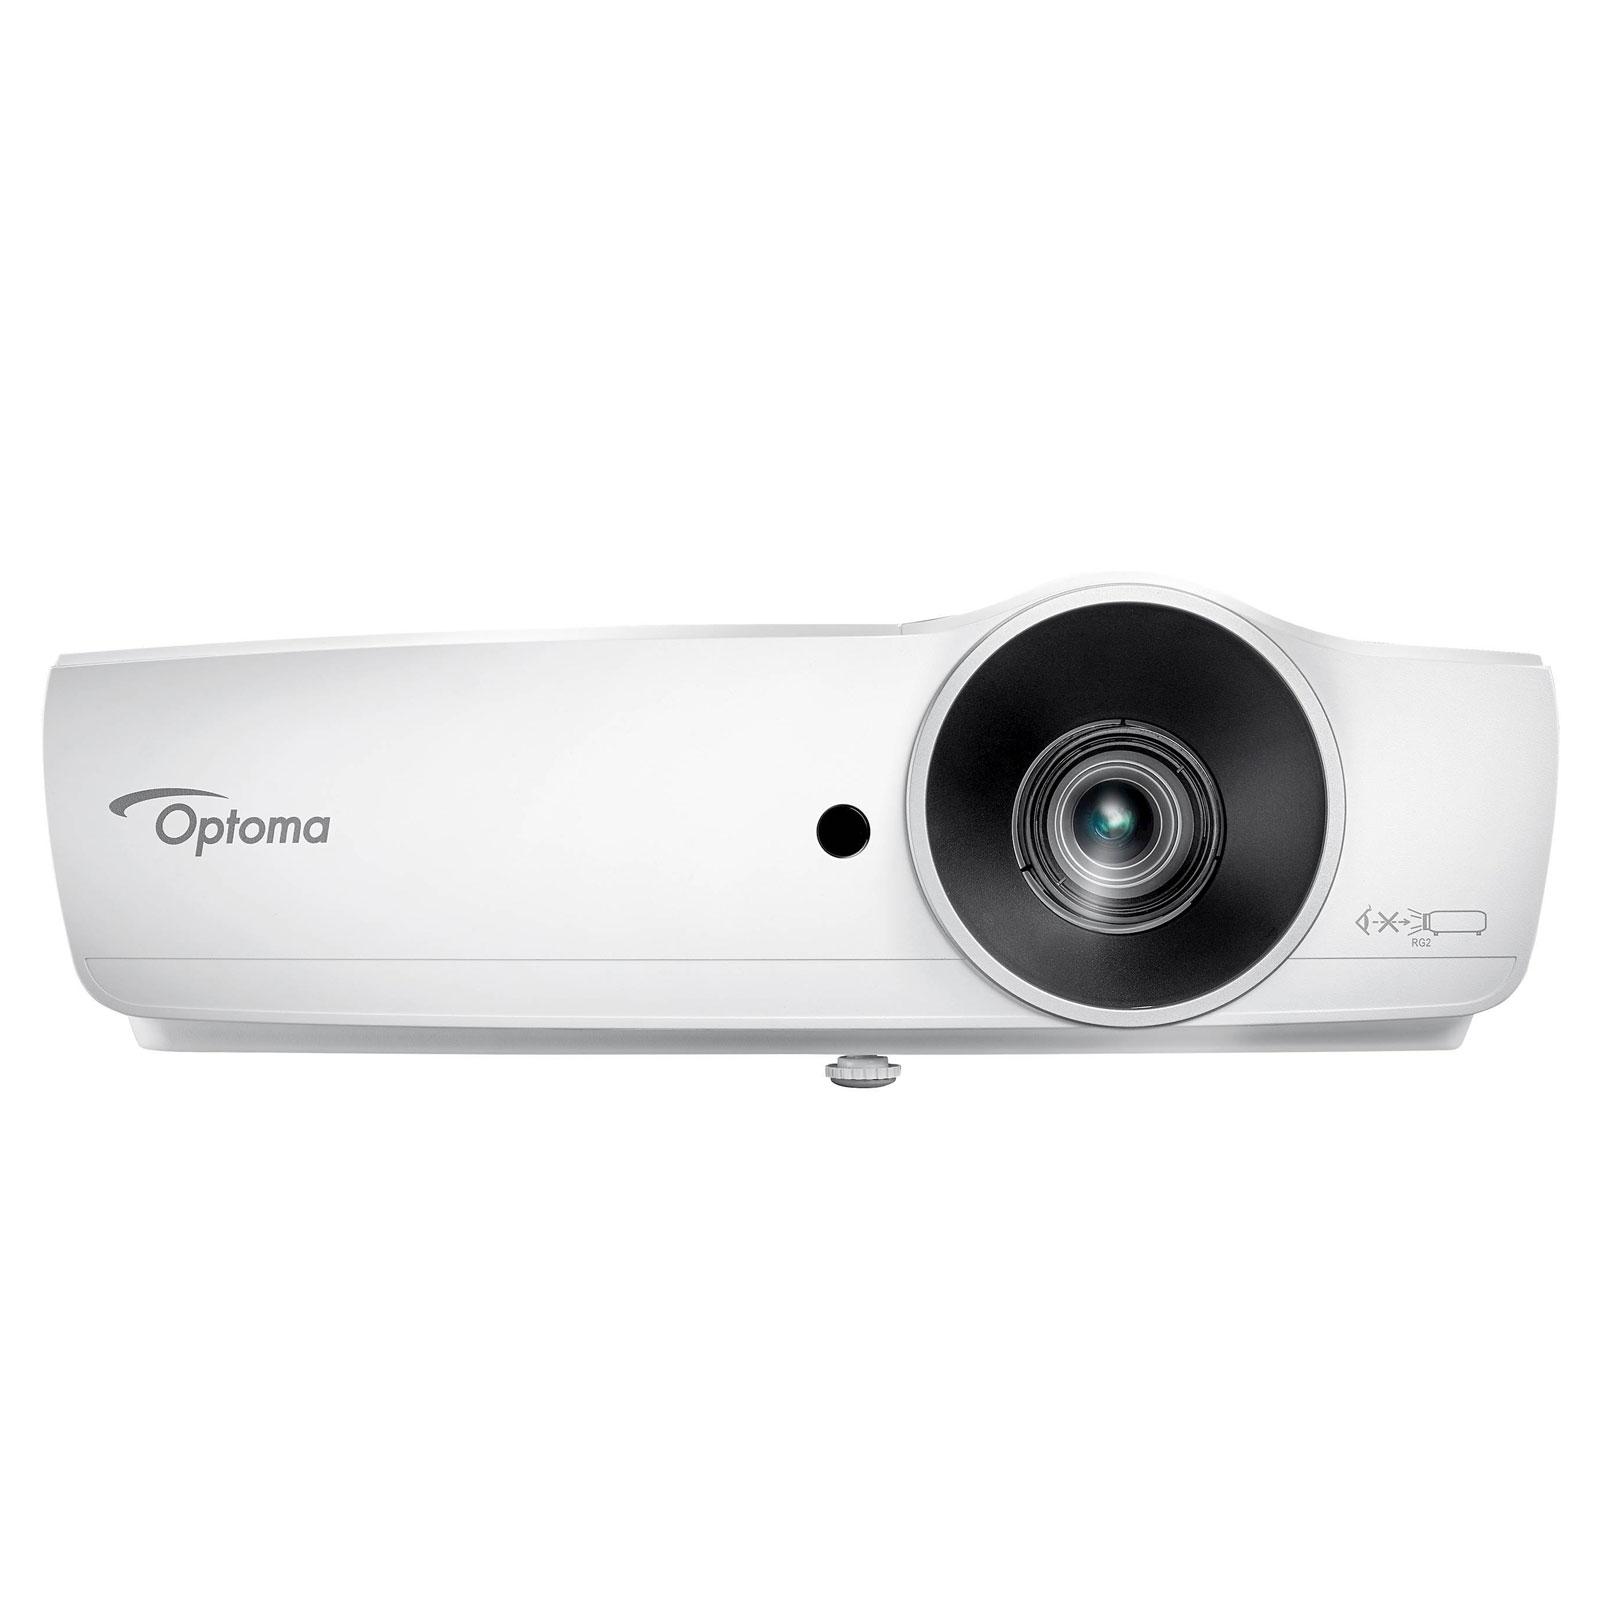 Vidéoprojecteur Optoma EH461 Vidéoprojecteur DLP Full HD 1080p Full 3D 5000 Lumens, HDMI MHL, Ethernet avec haut-parleur 10W